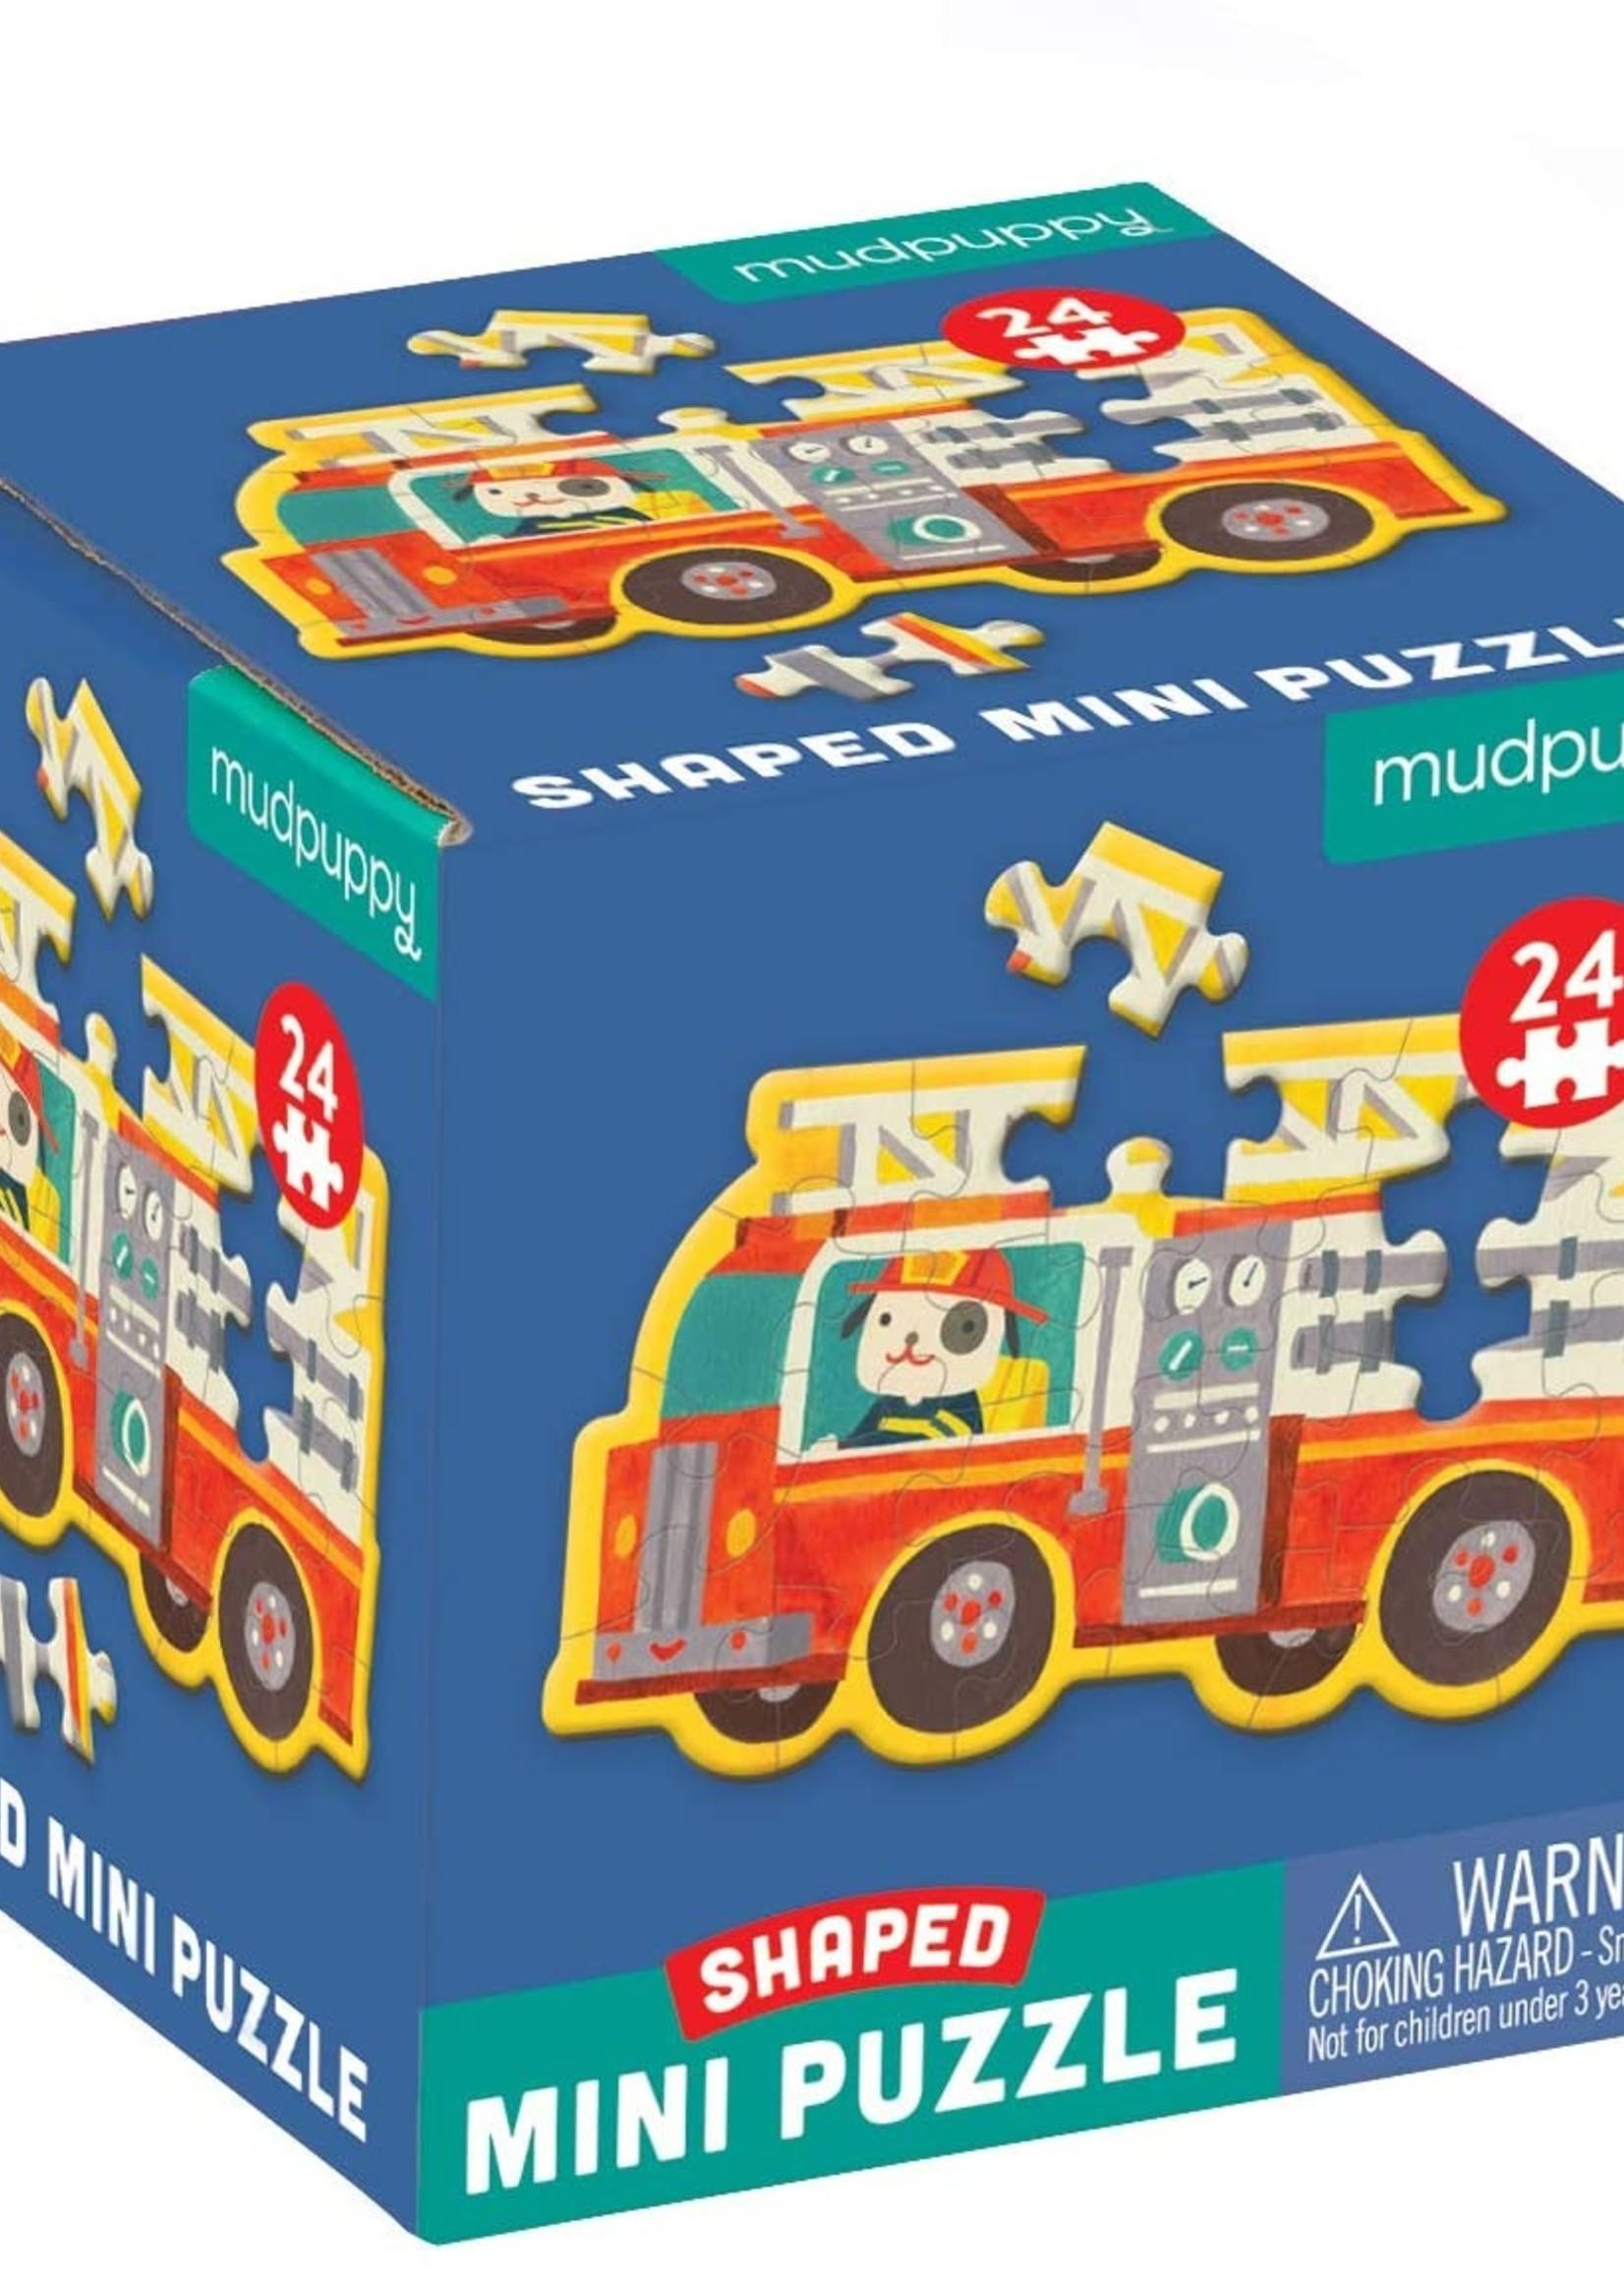 hatchett book group firetruck shaped mini puzzle